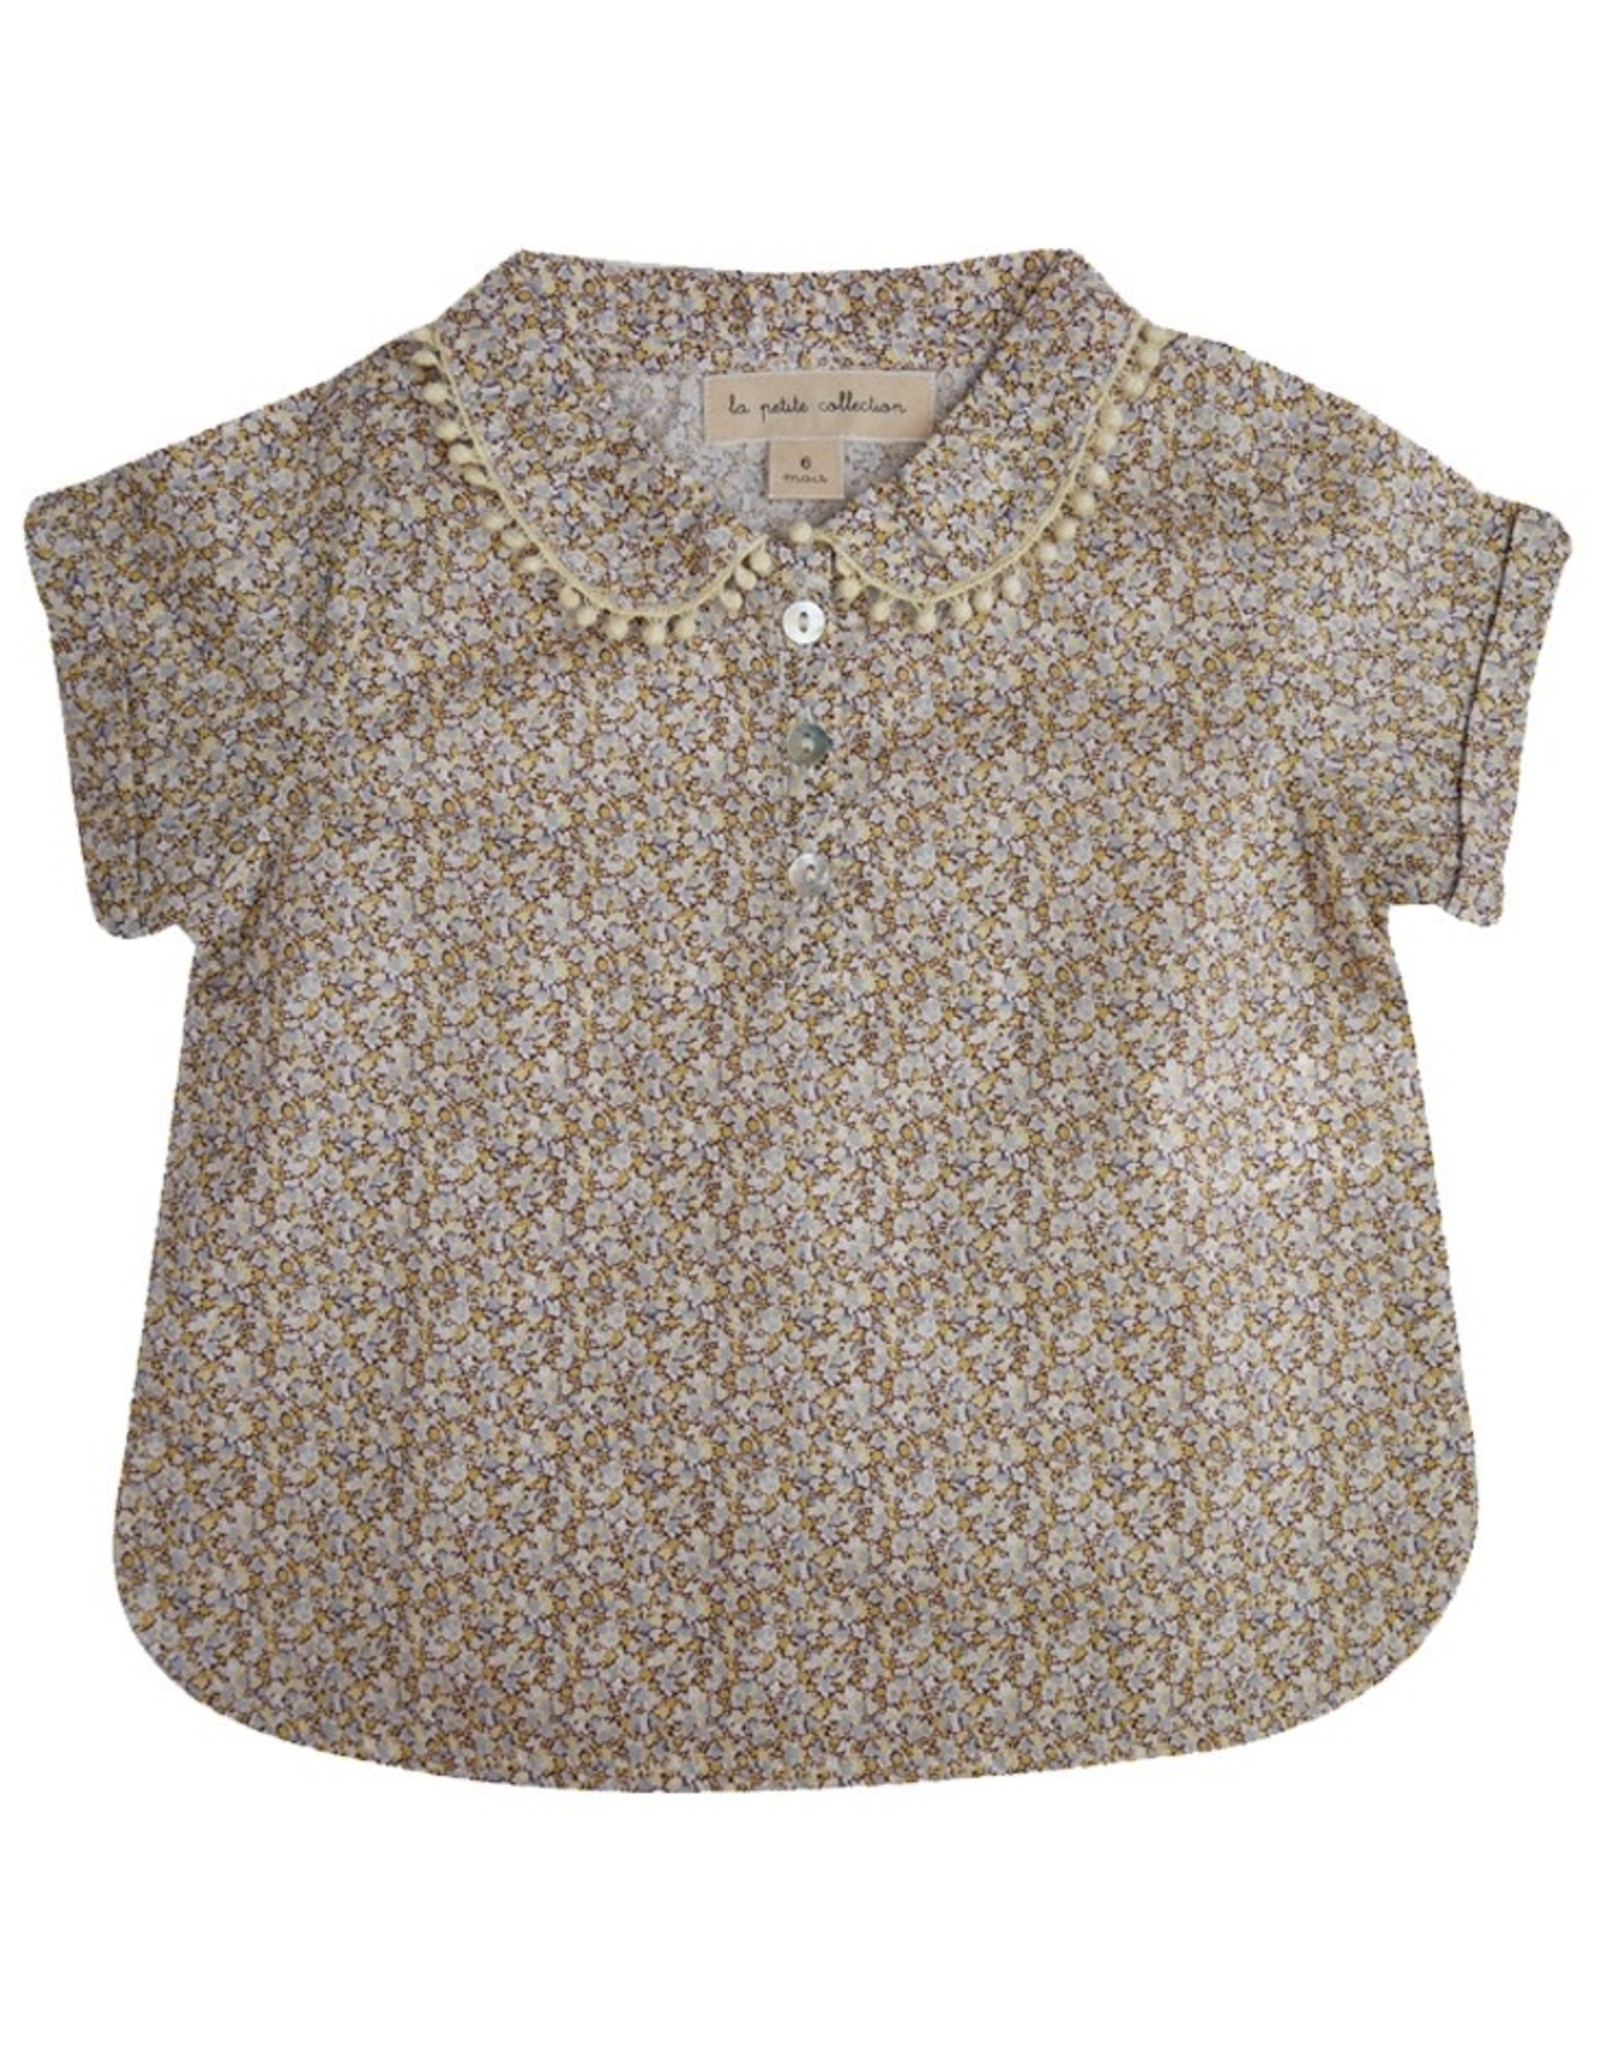 La Petite Collection Pepper blouse, Liberty print